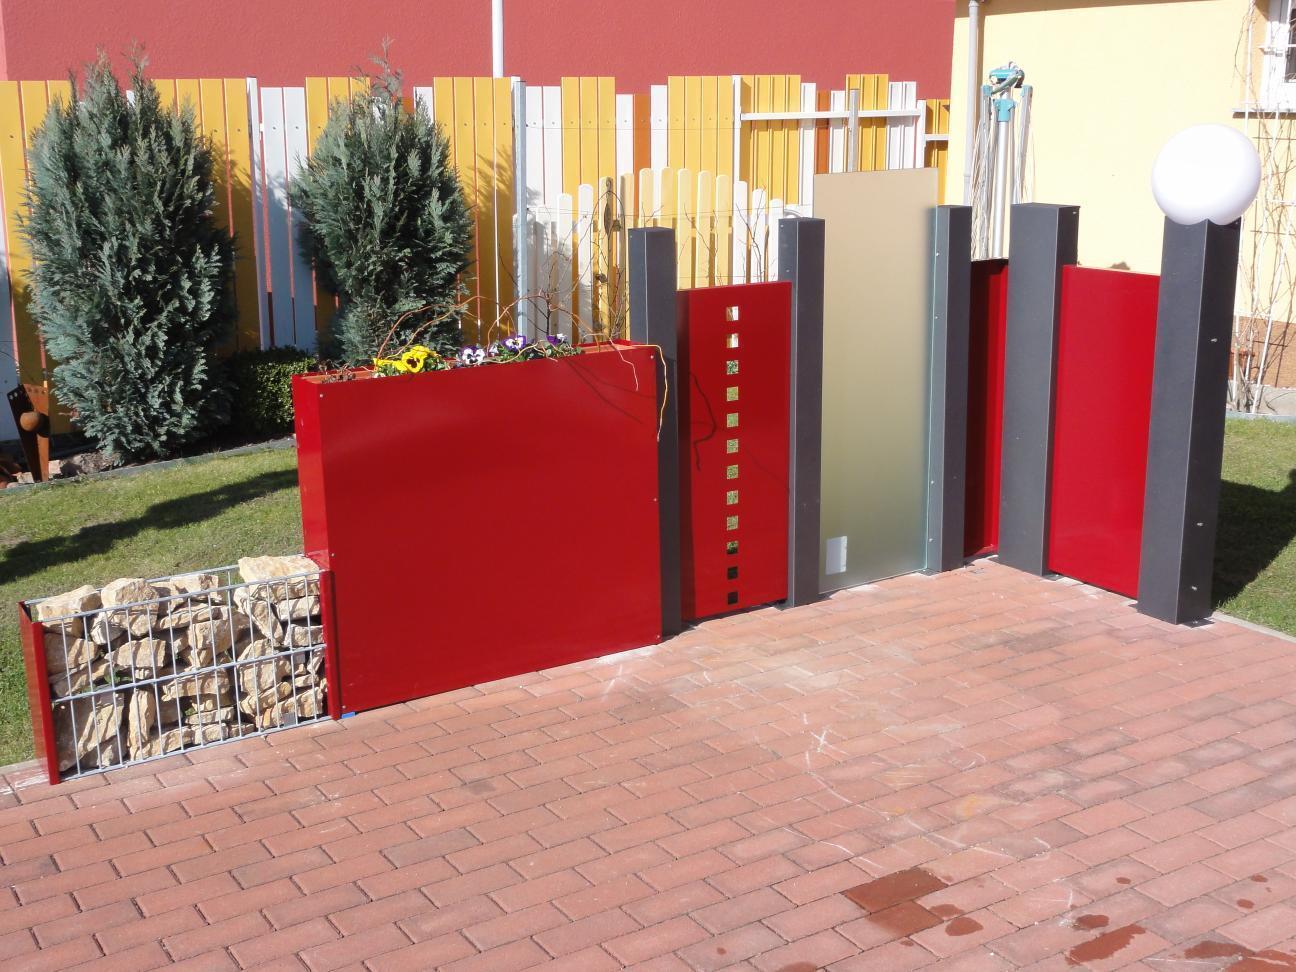 soloblech modular dekorstanzung 175 x 62 cm alles f r haus und garten aus metall. Black Bedroom Furniture Sets. Home Design Ideas